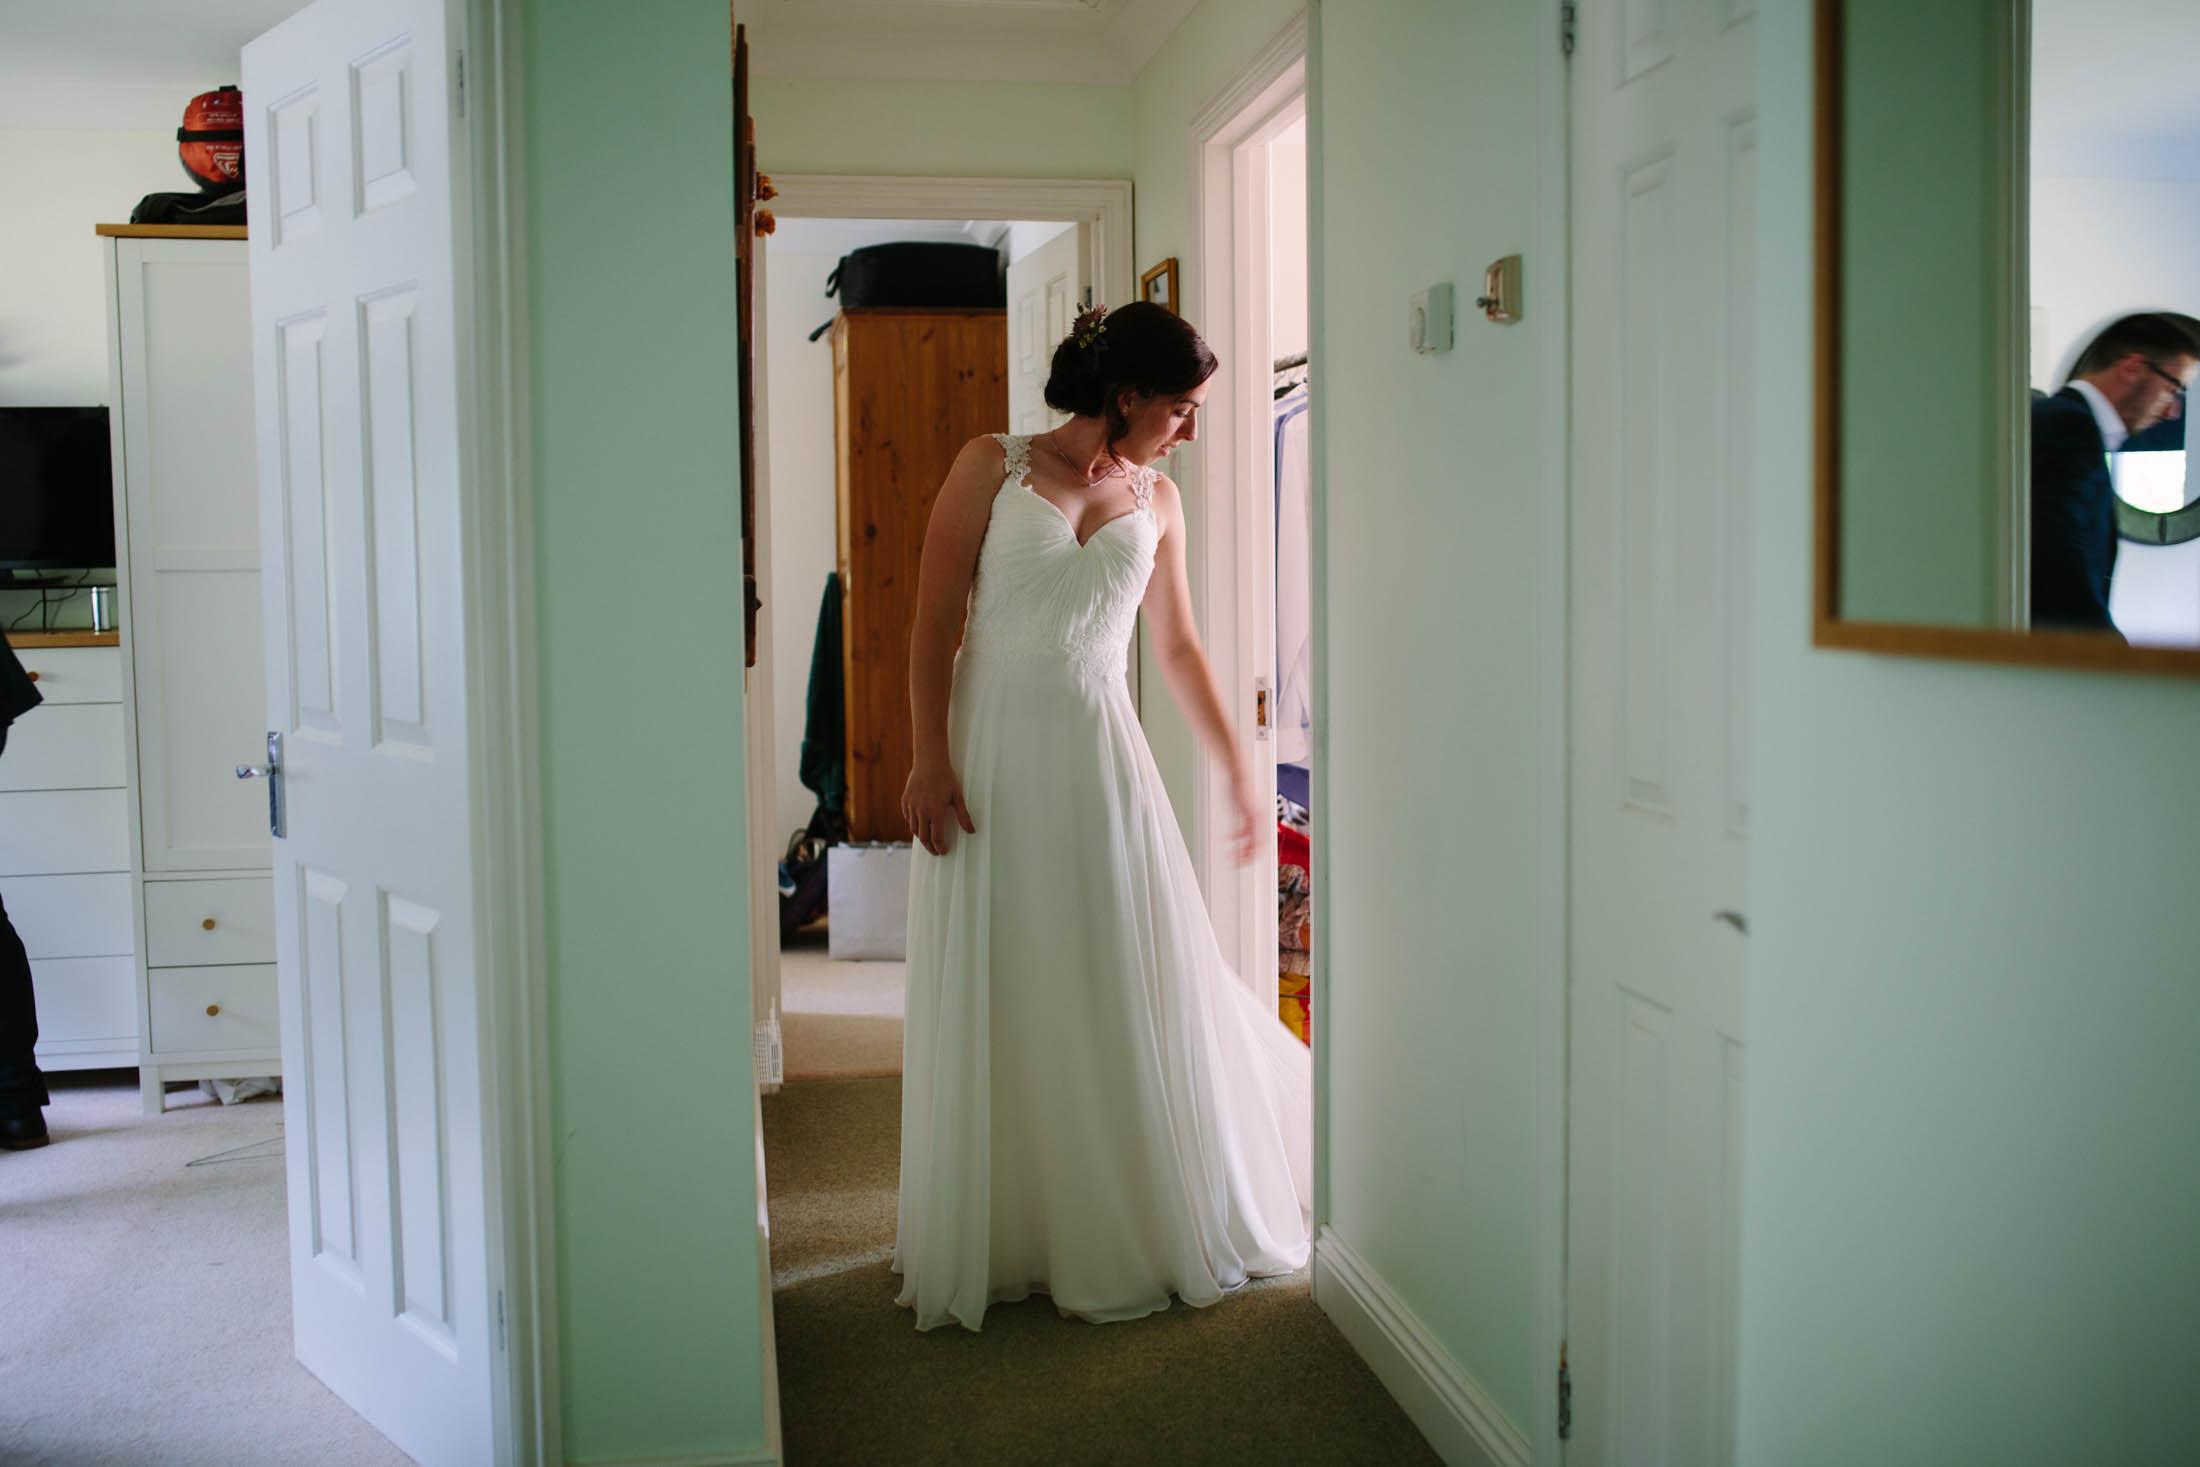 JessicaJillPhotography-HarewoodsHomeFarmWedding-SouthEastWeddingPhotographer-15.jpg